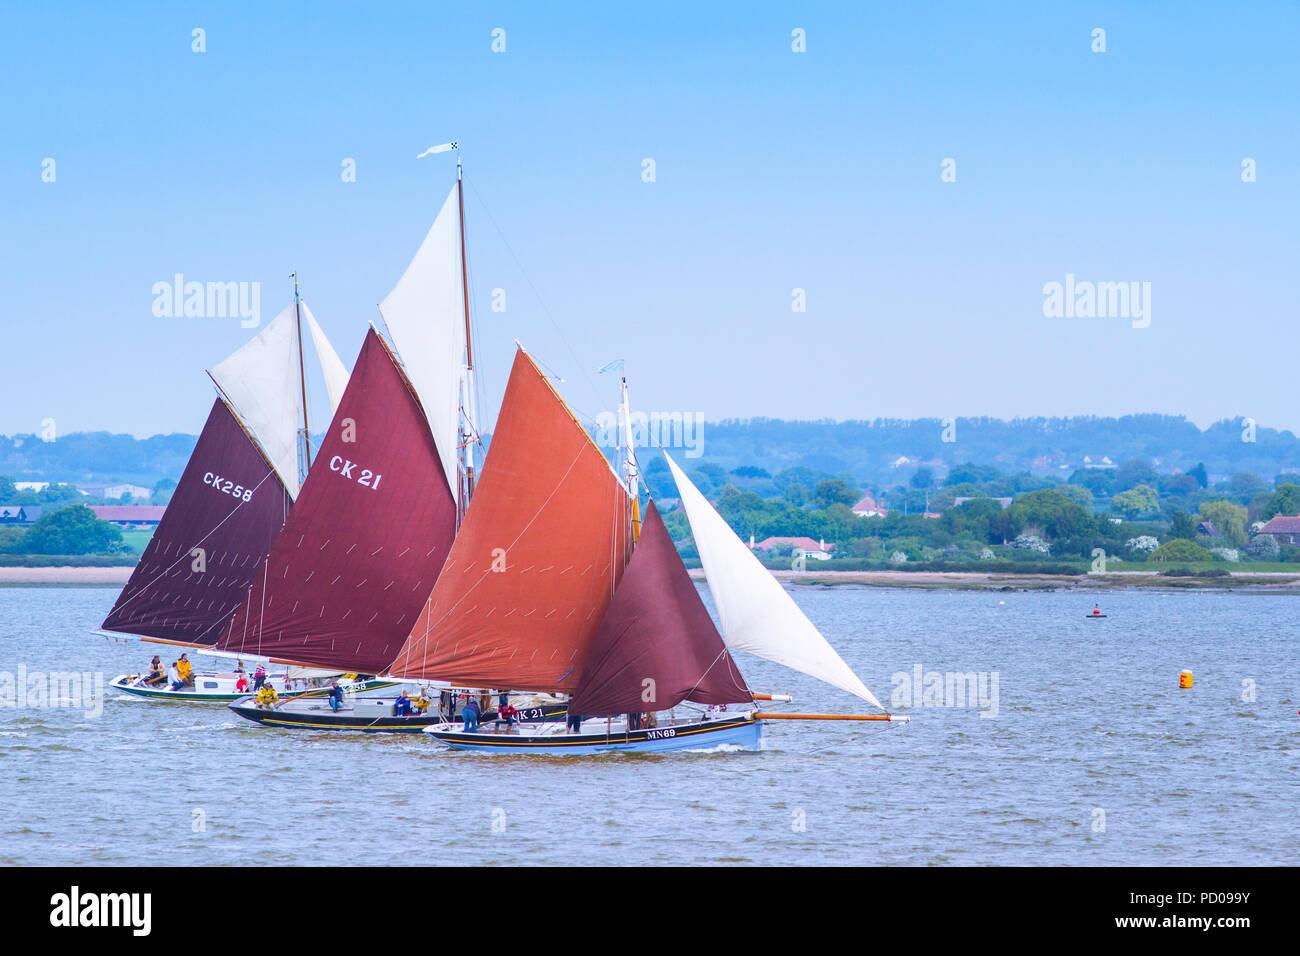 Skiffs racing on the Blackwater. - Stock Image